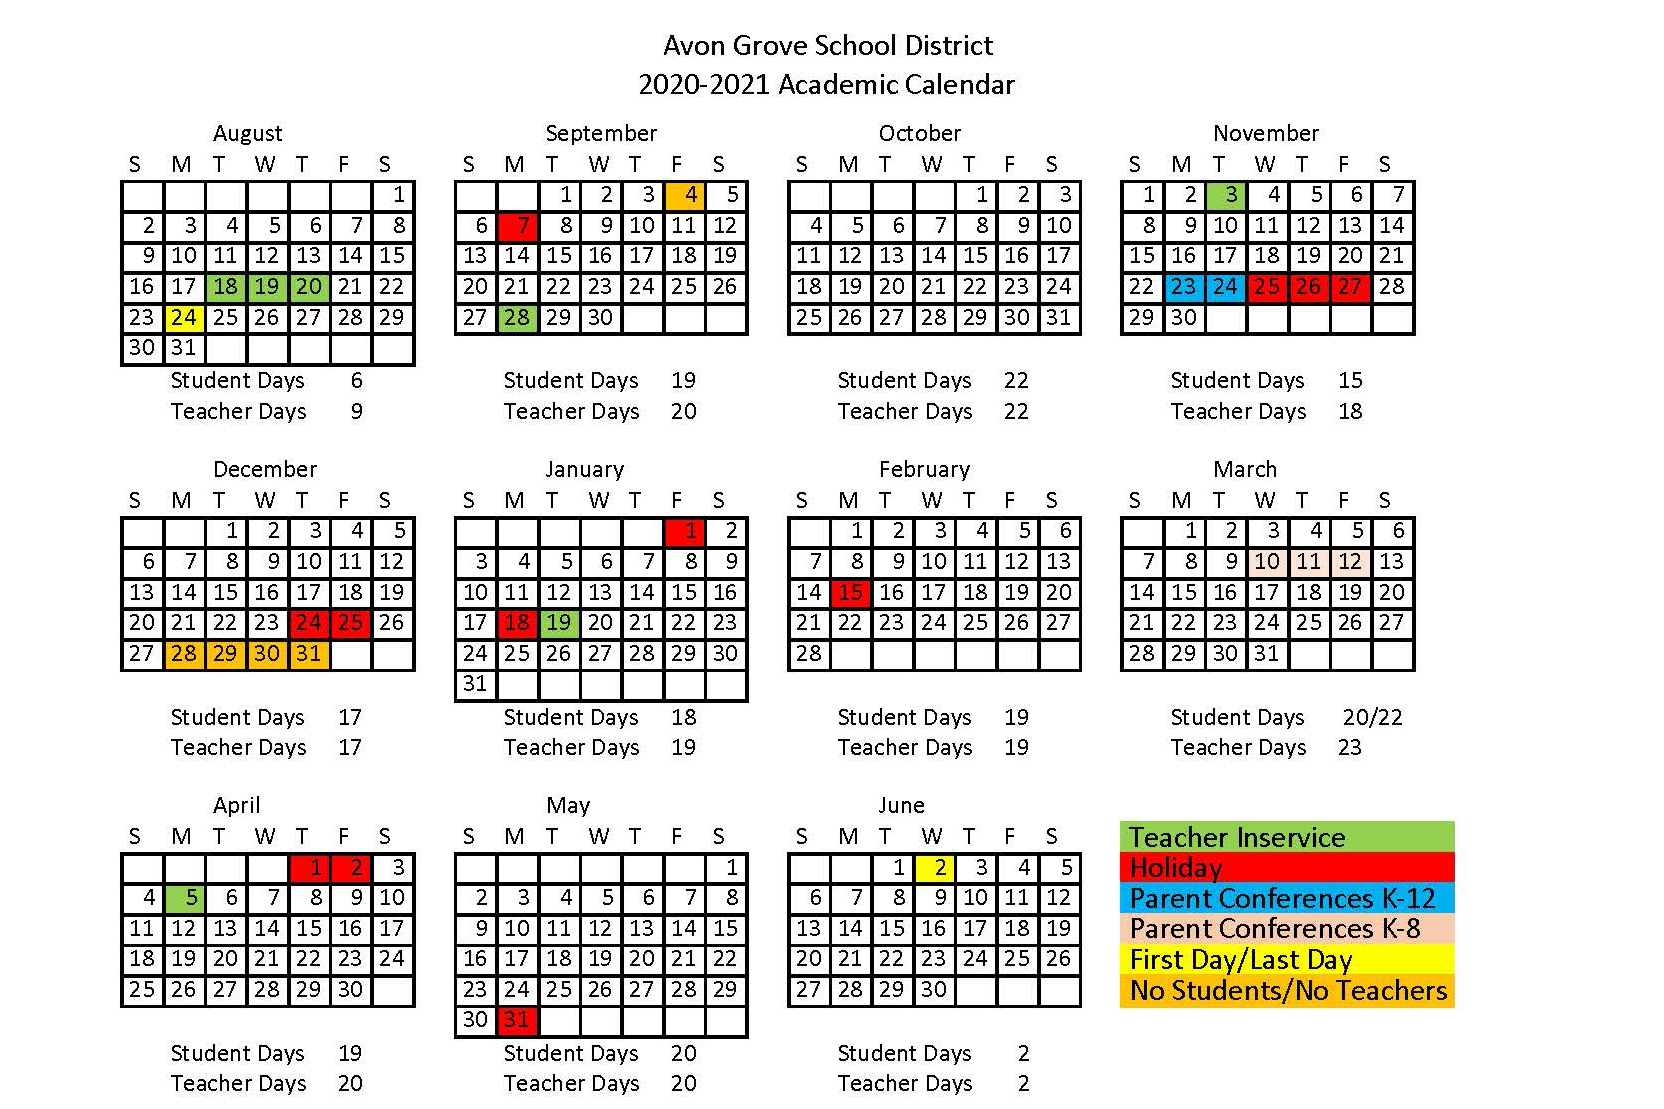 Home - Avon Grove School District Throughout Harrison School District 2 Calendar 2021